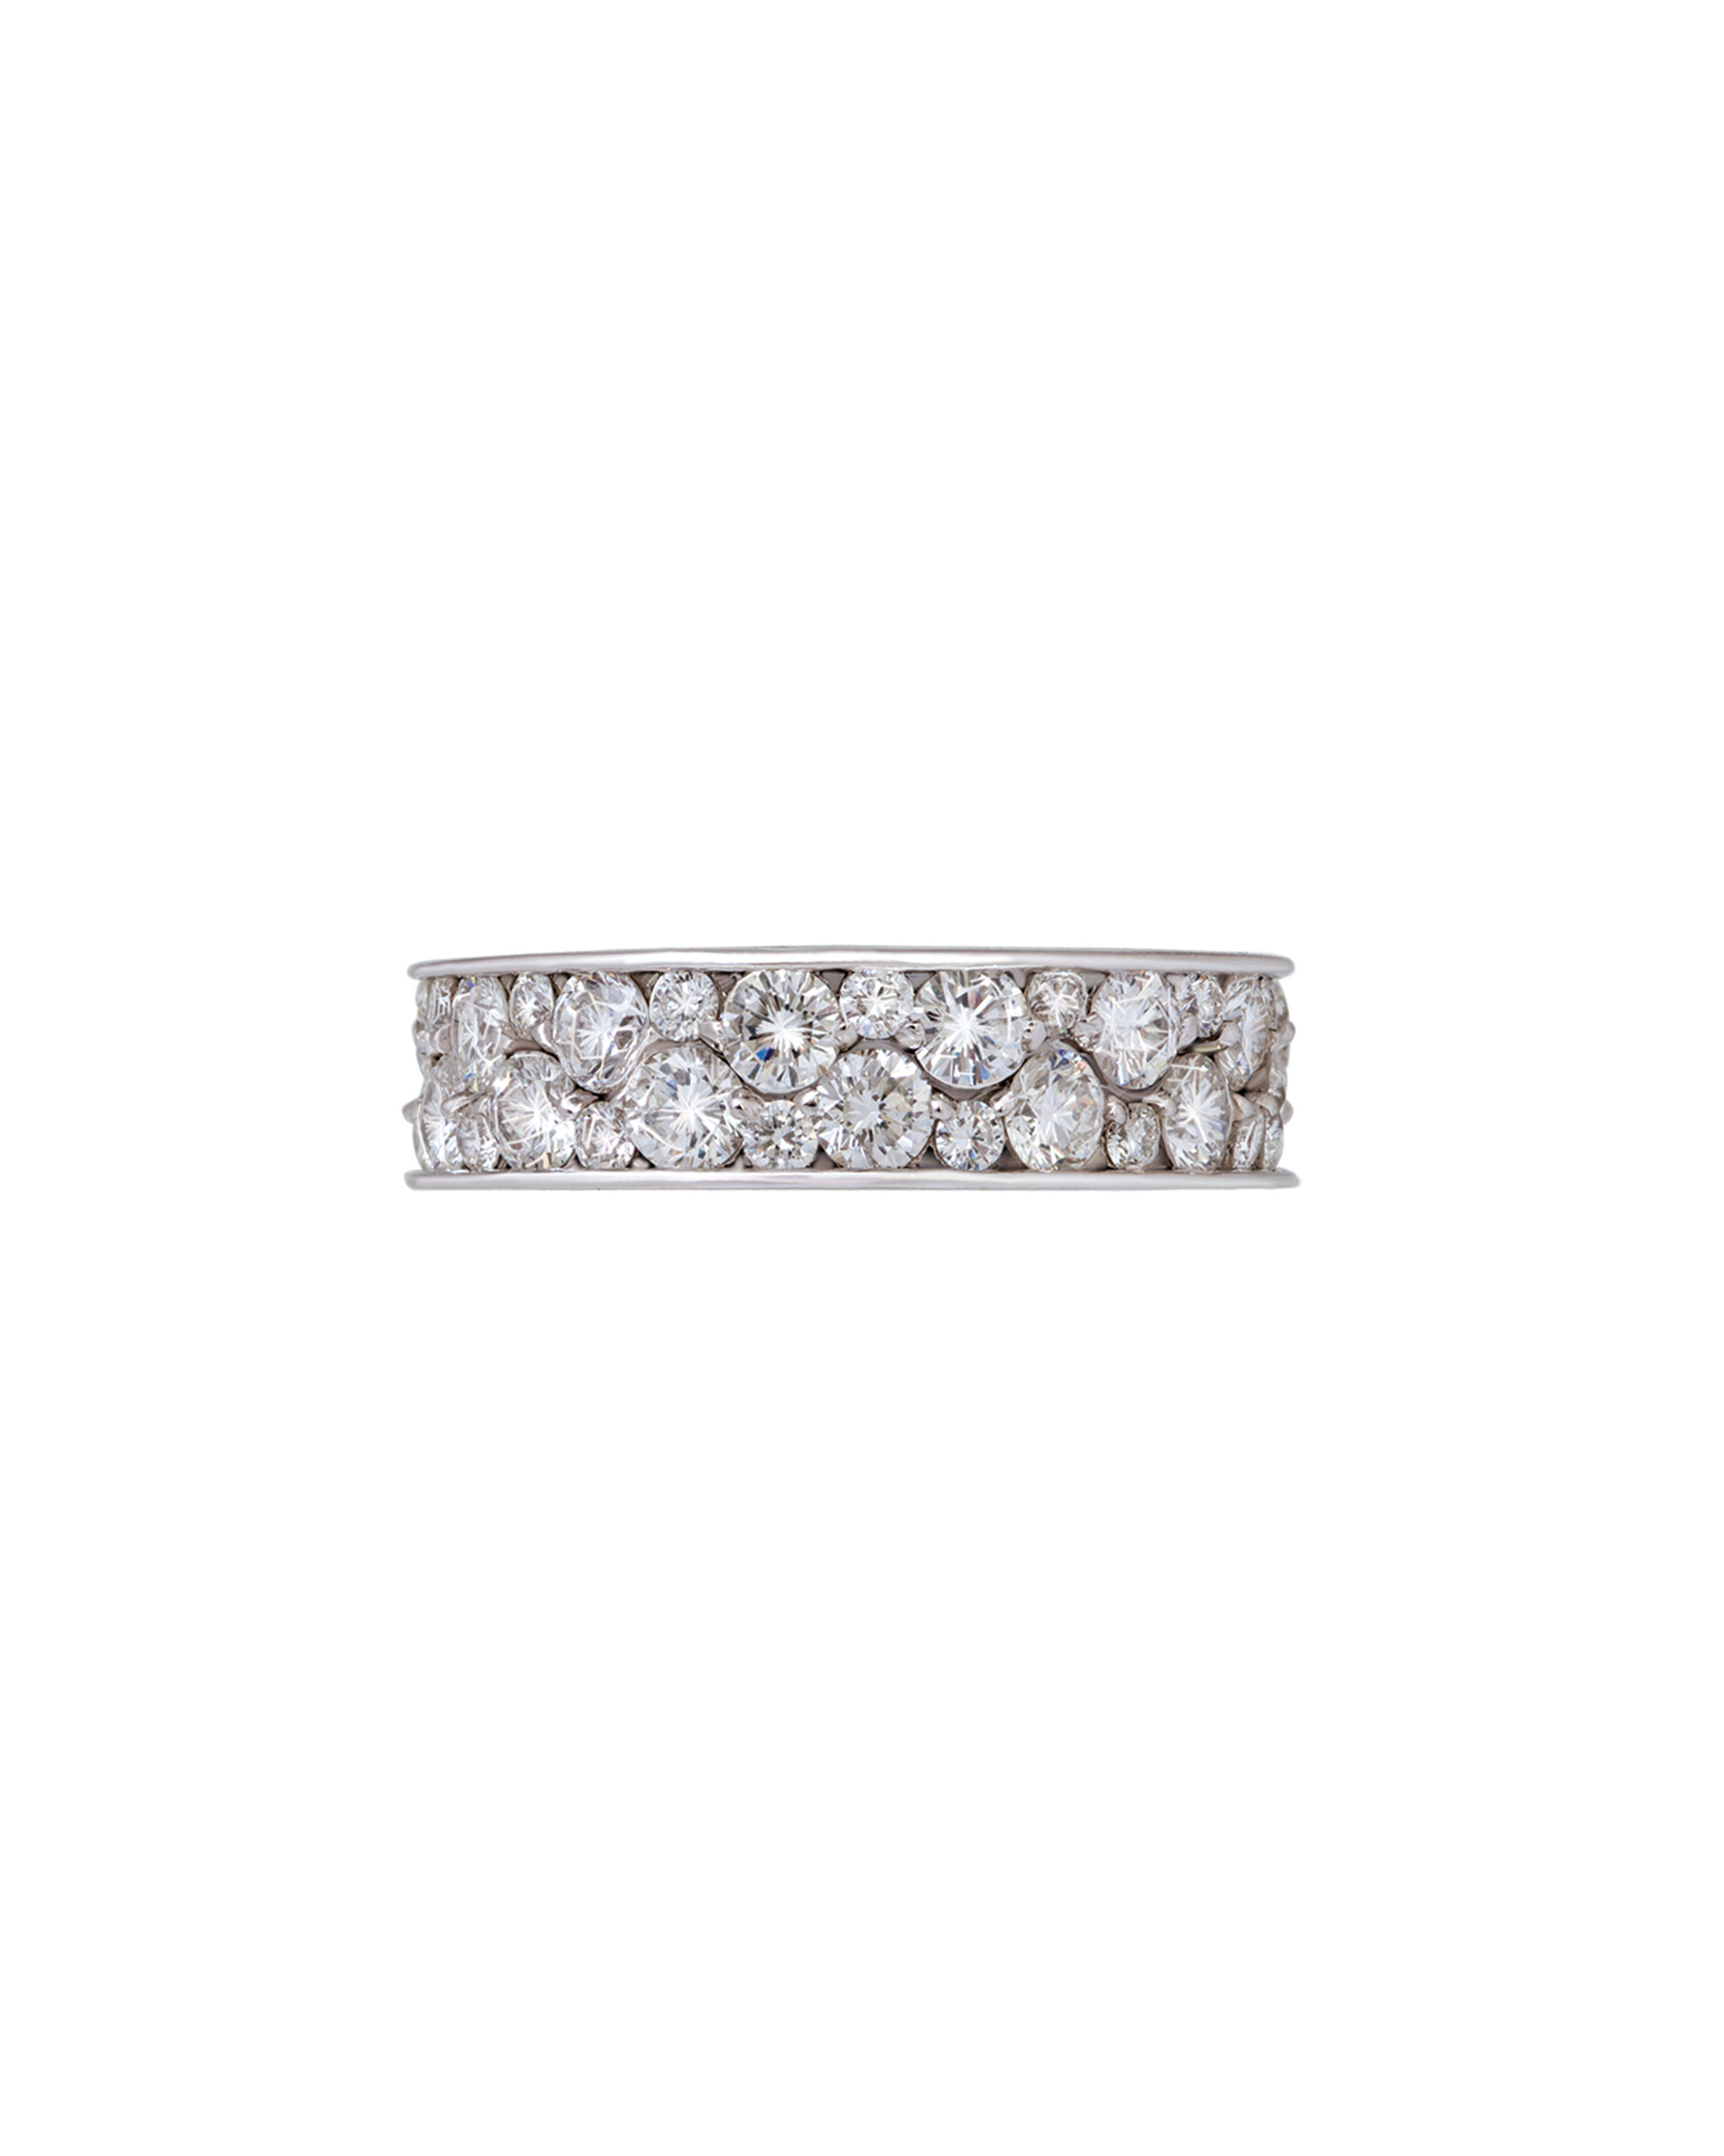 designer diamond bridal jewelry-2-3.jpg